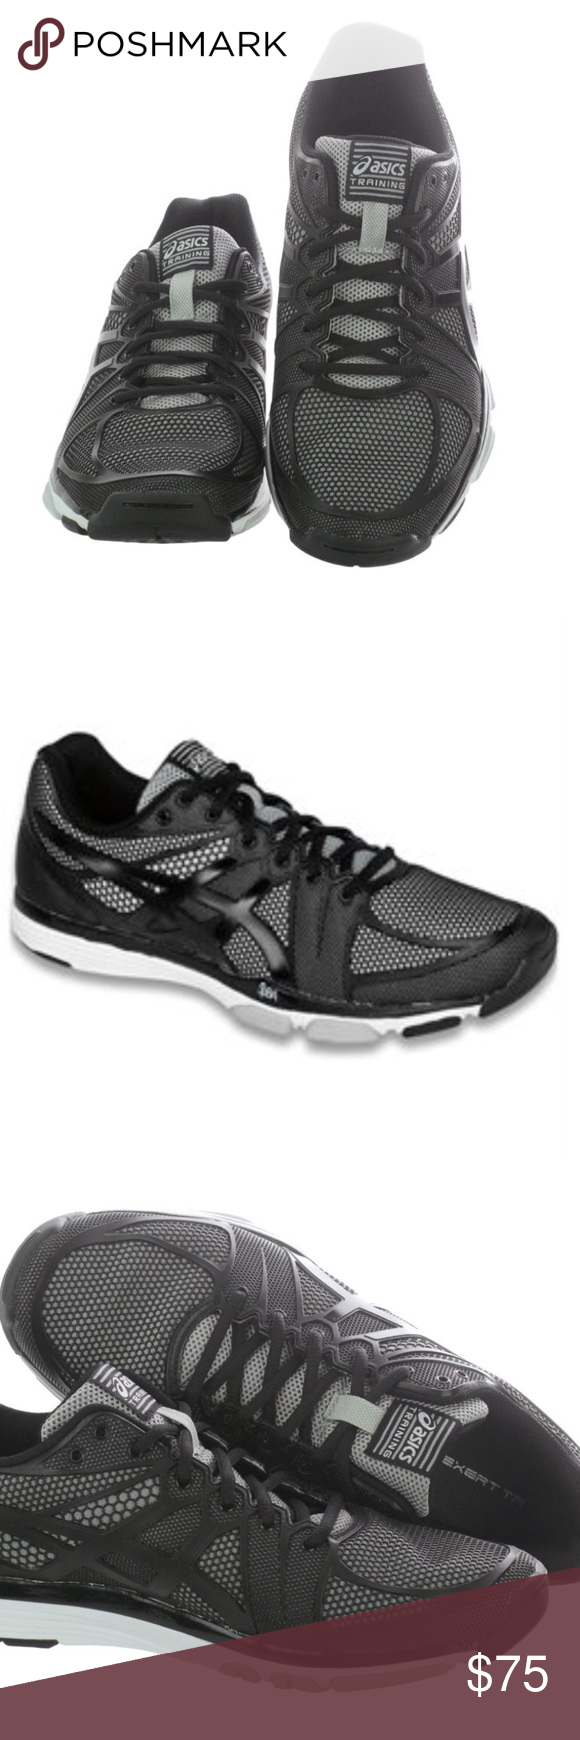 ️Brand New Asics GelExert TR Running Shoes Shoes